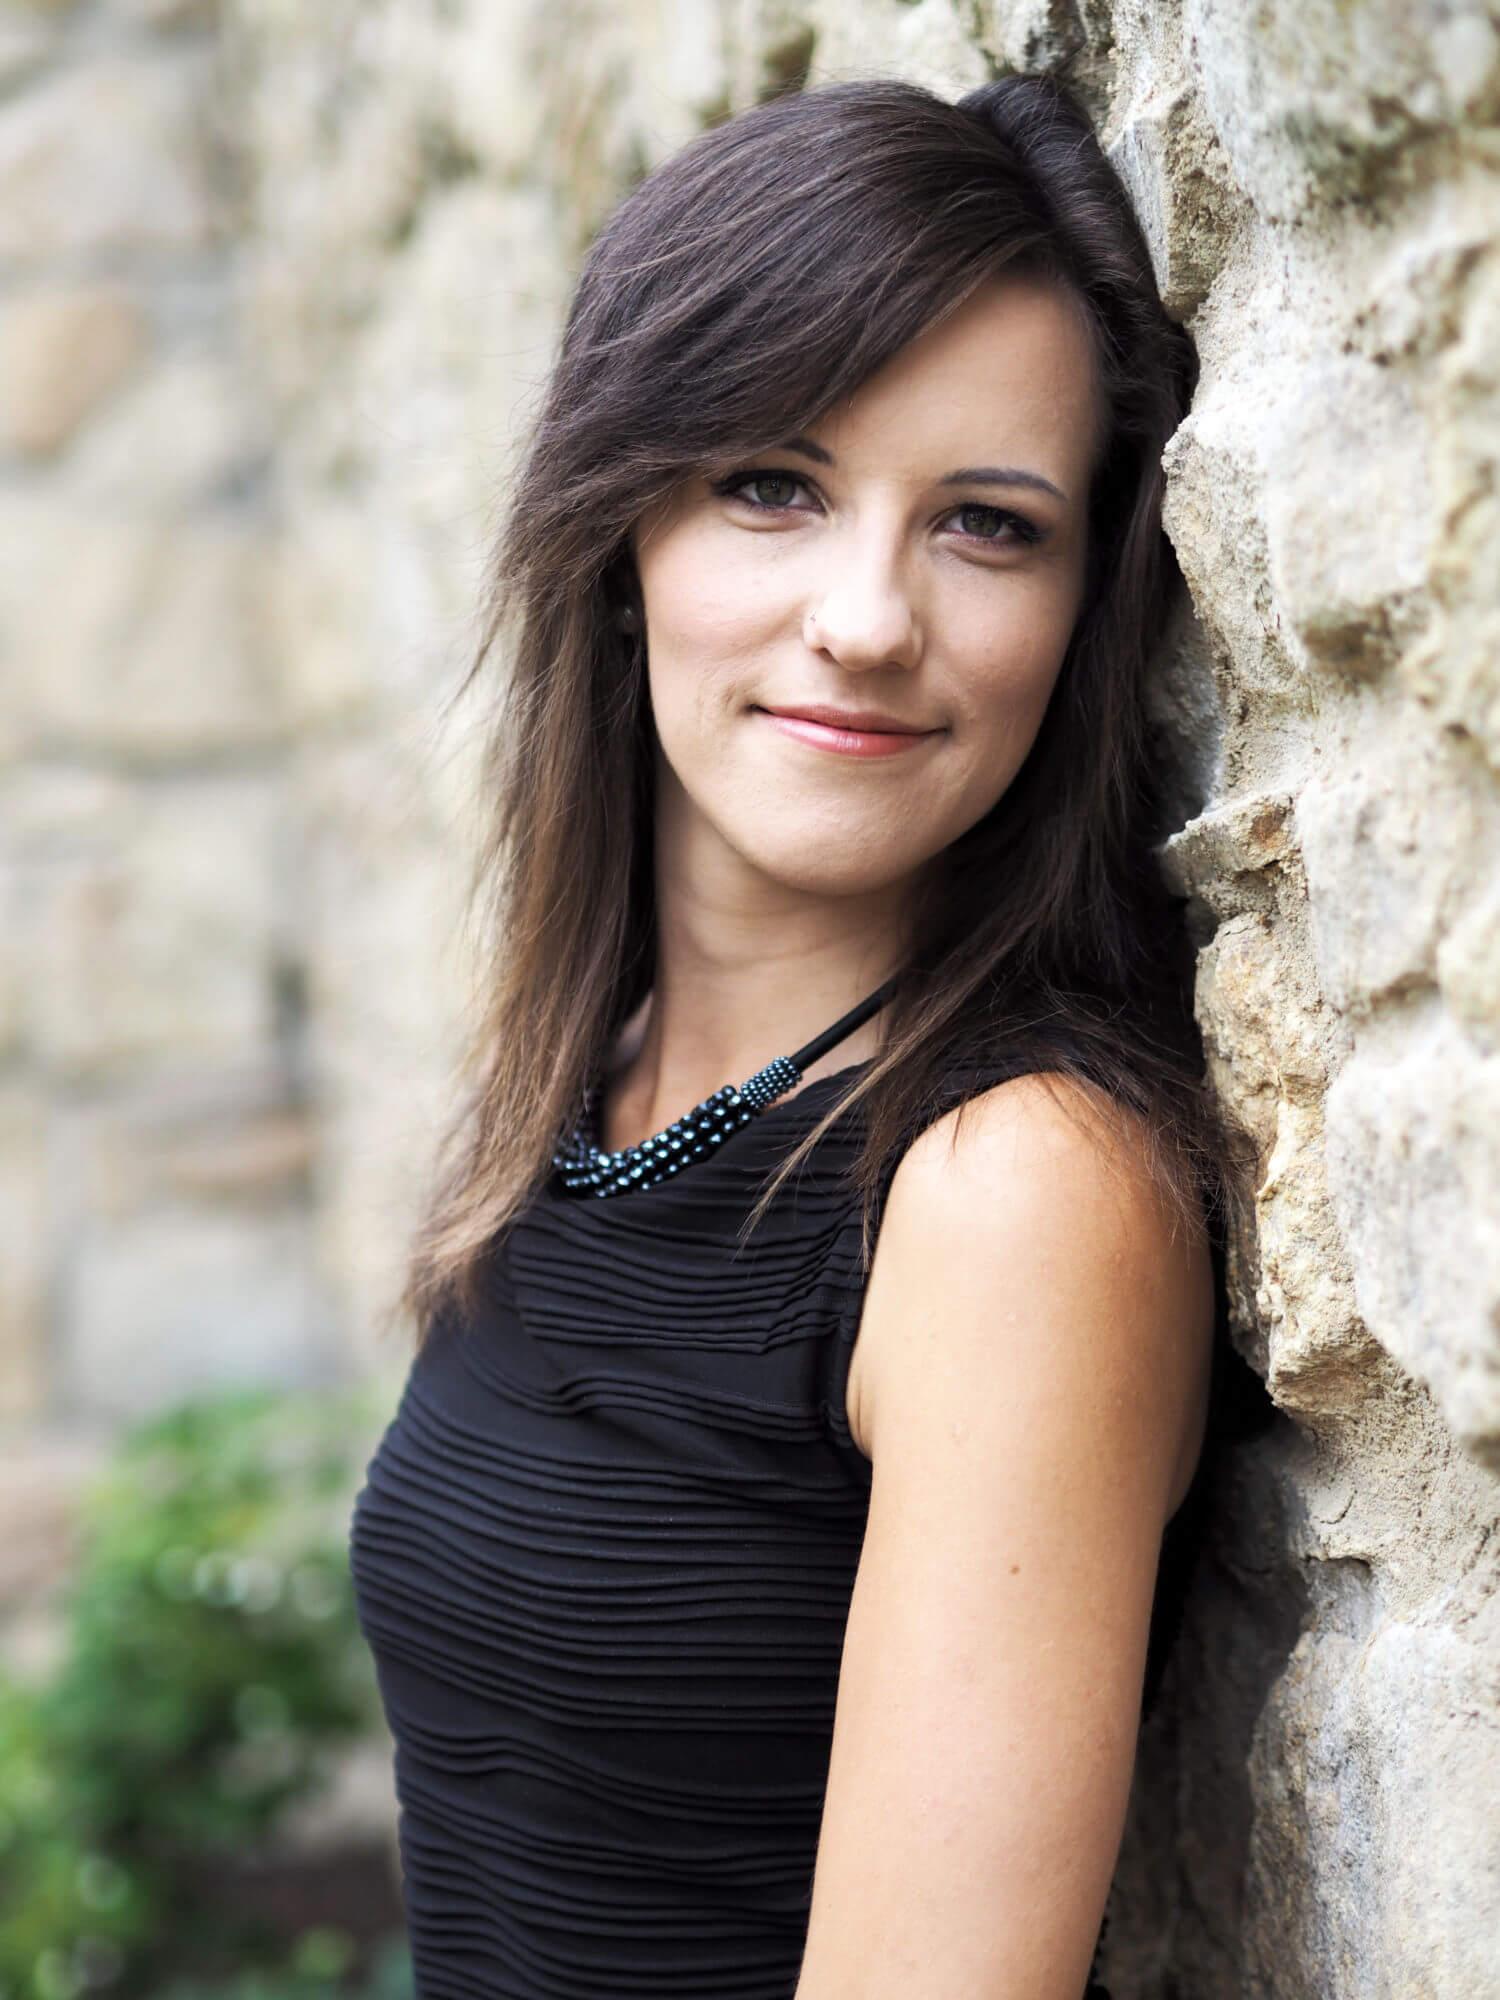 Aneta Štěpánková - fotografie uzdi